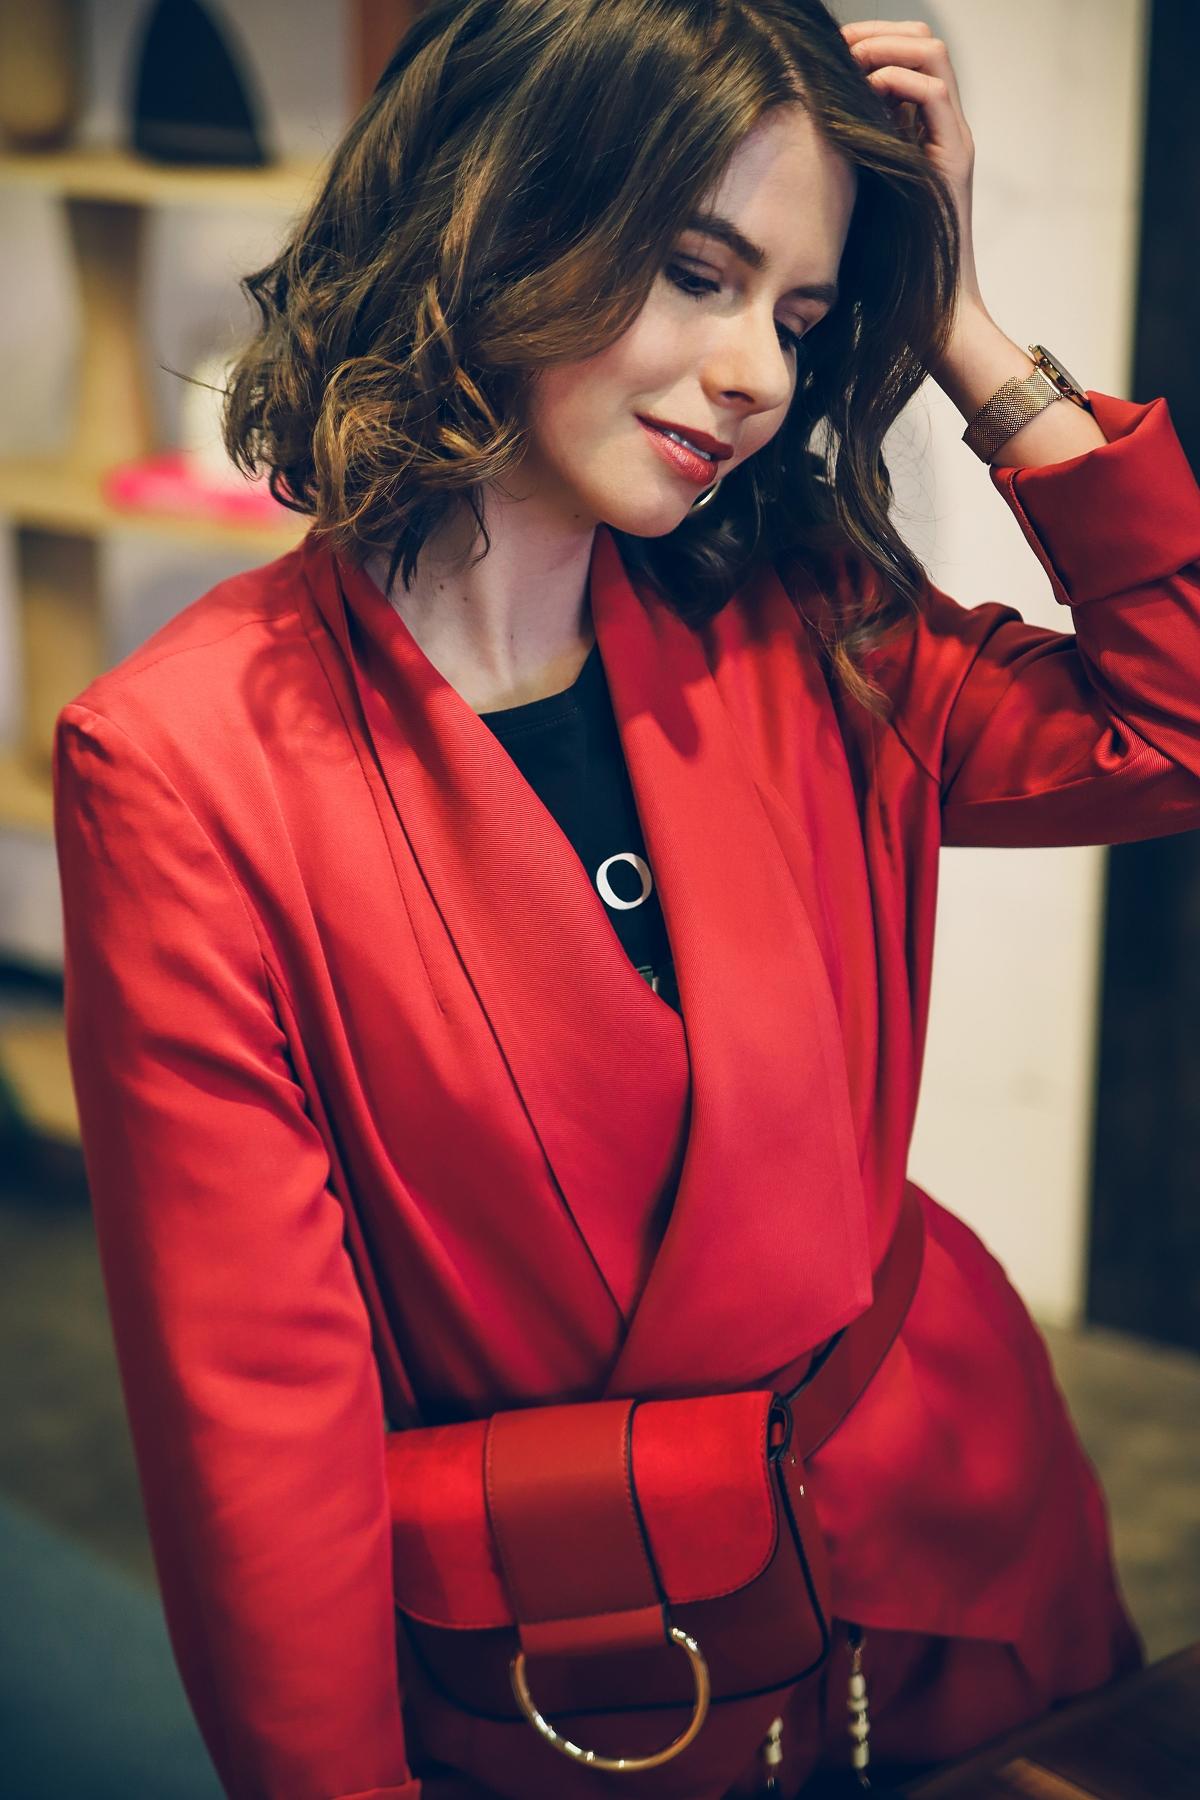 damski garnitur orsay szorty blog modowy